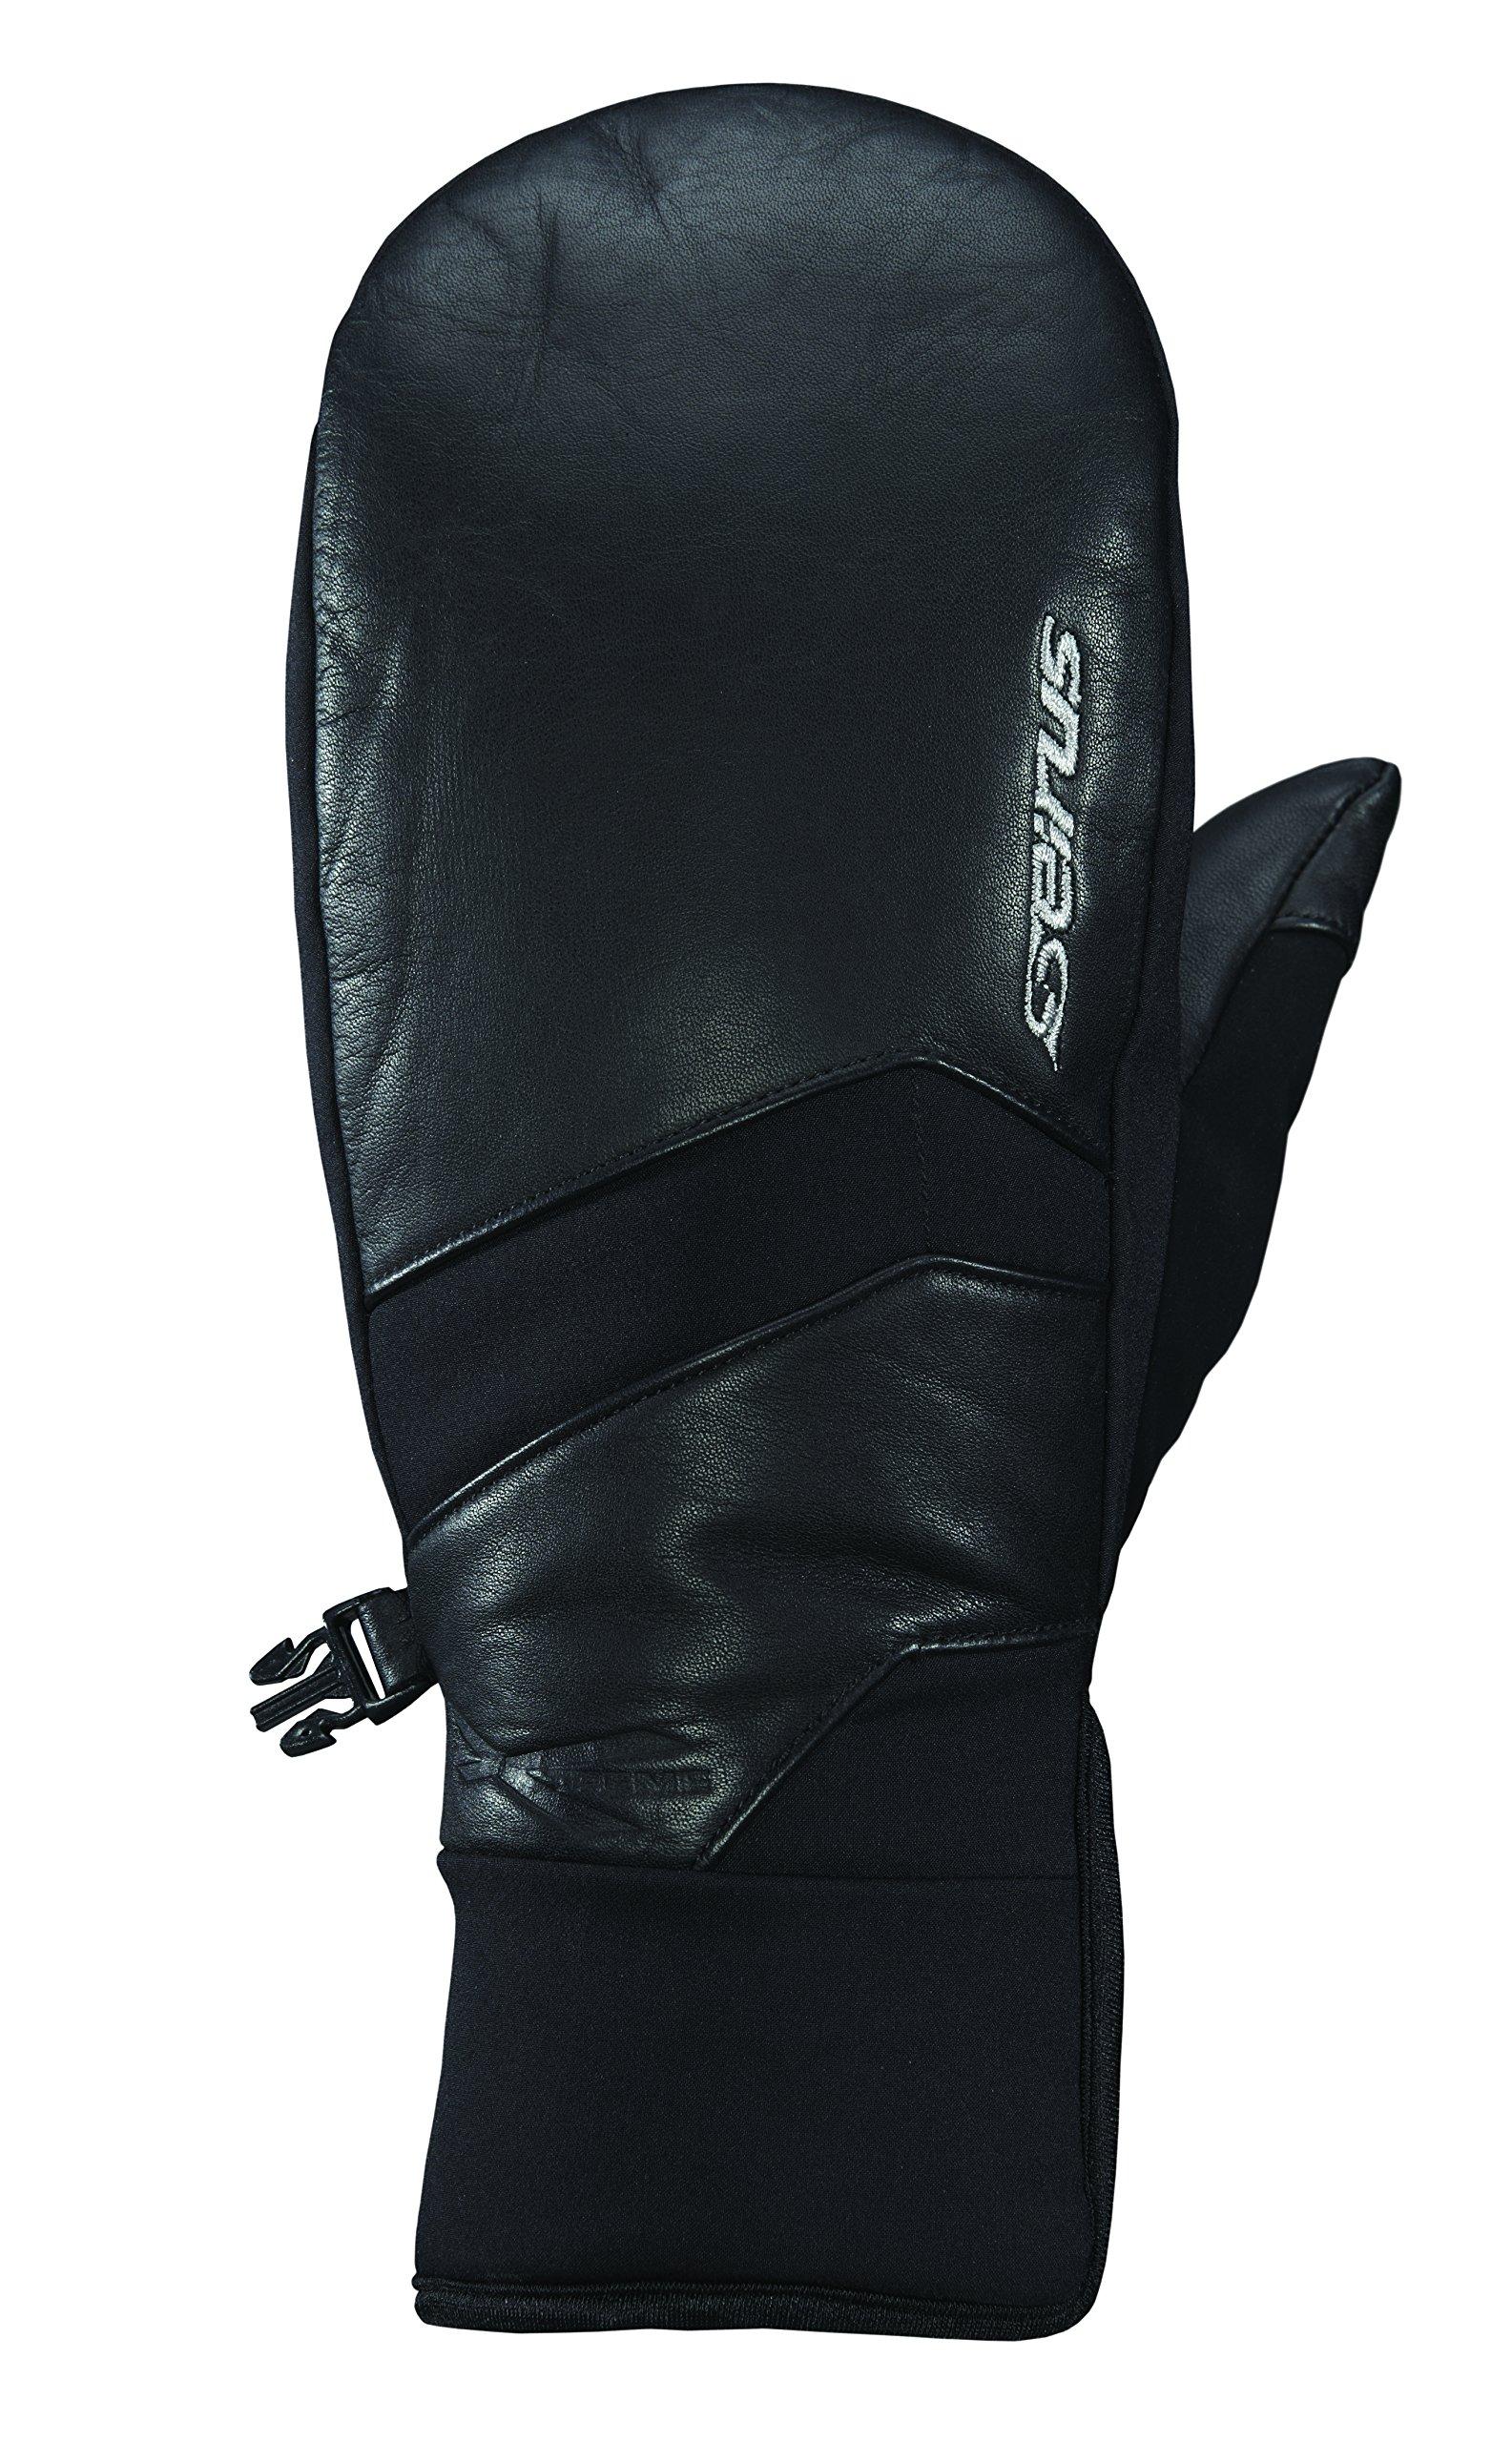 Seirus Innovation Men's Xtreme All Weather Edge Polartec Mittens, Black, Men's X-Large